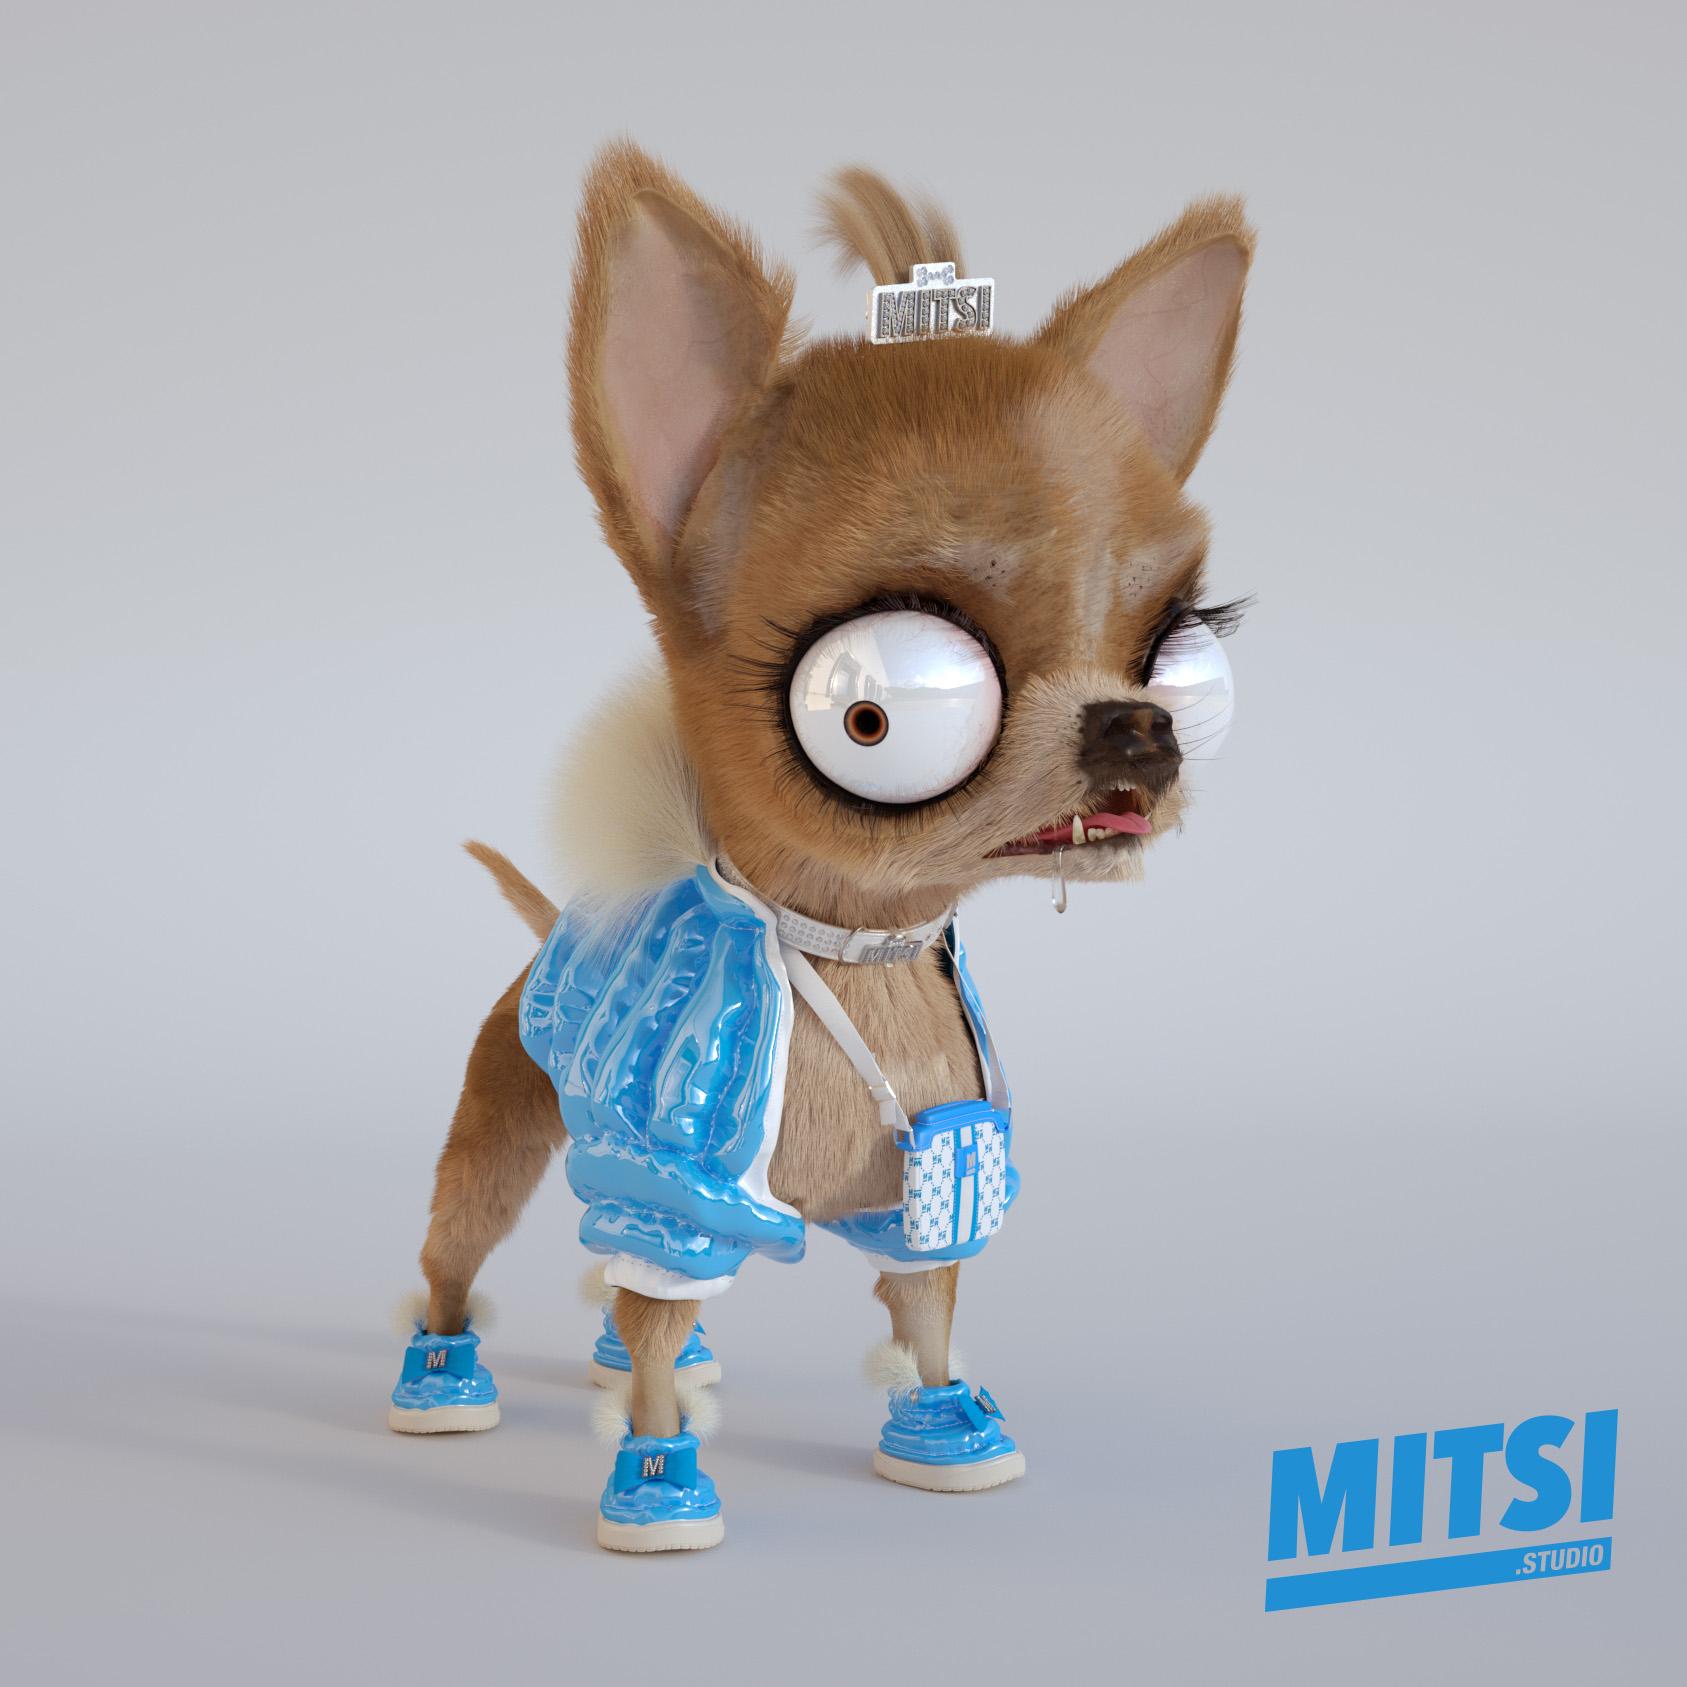 mitsi_studio_profile1.jpg